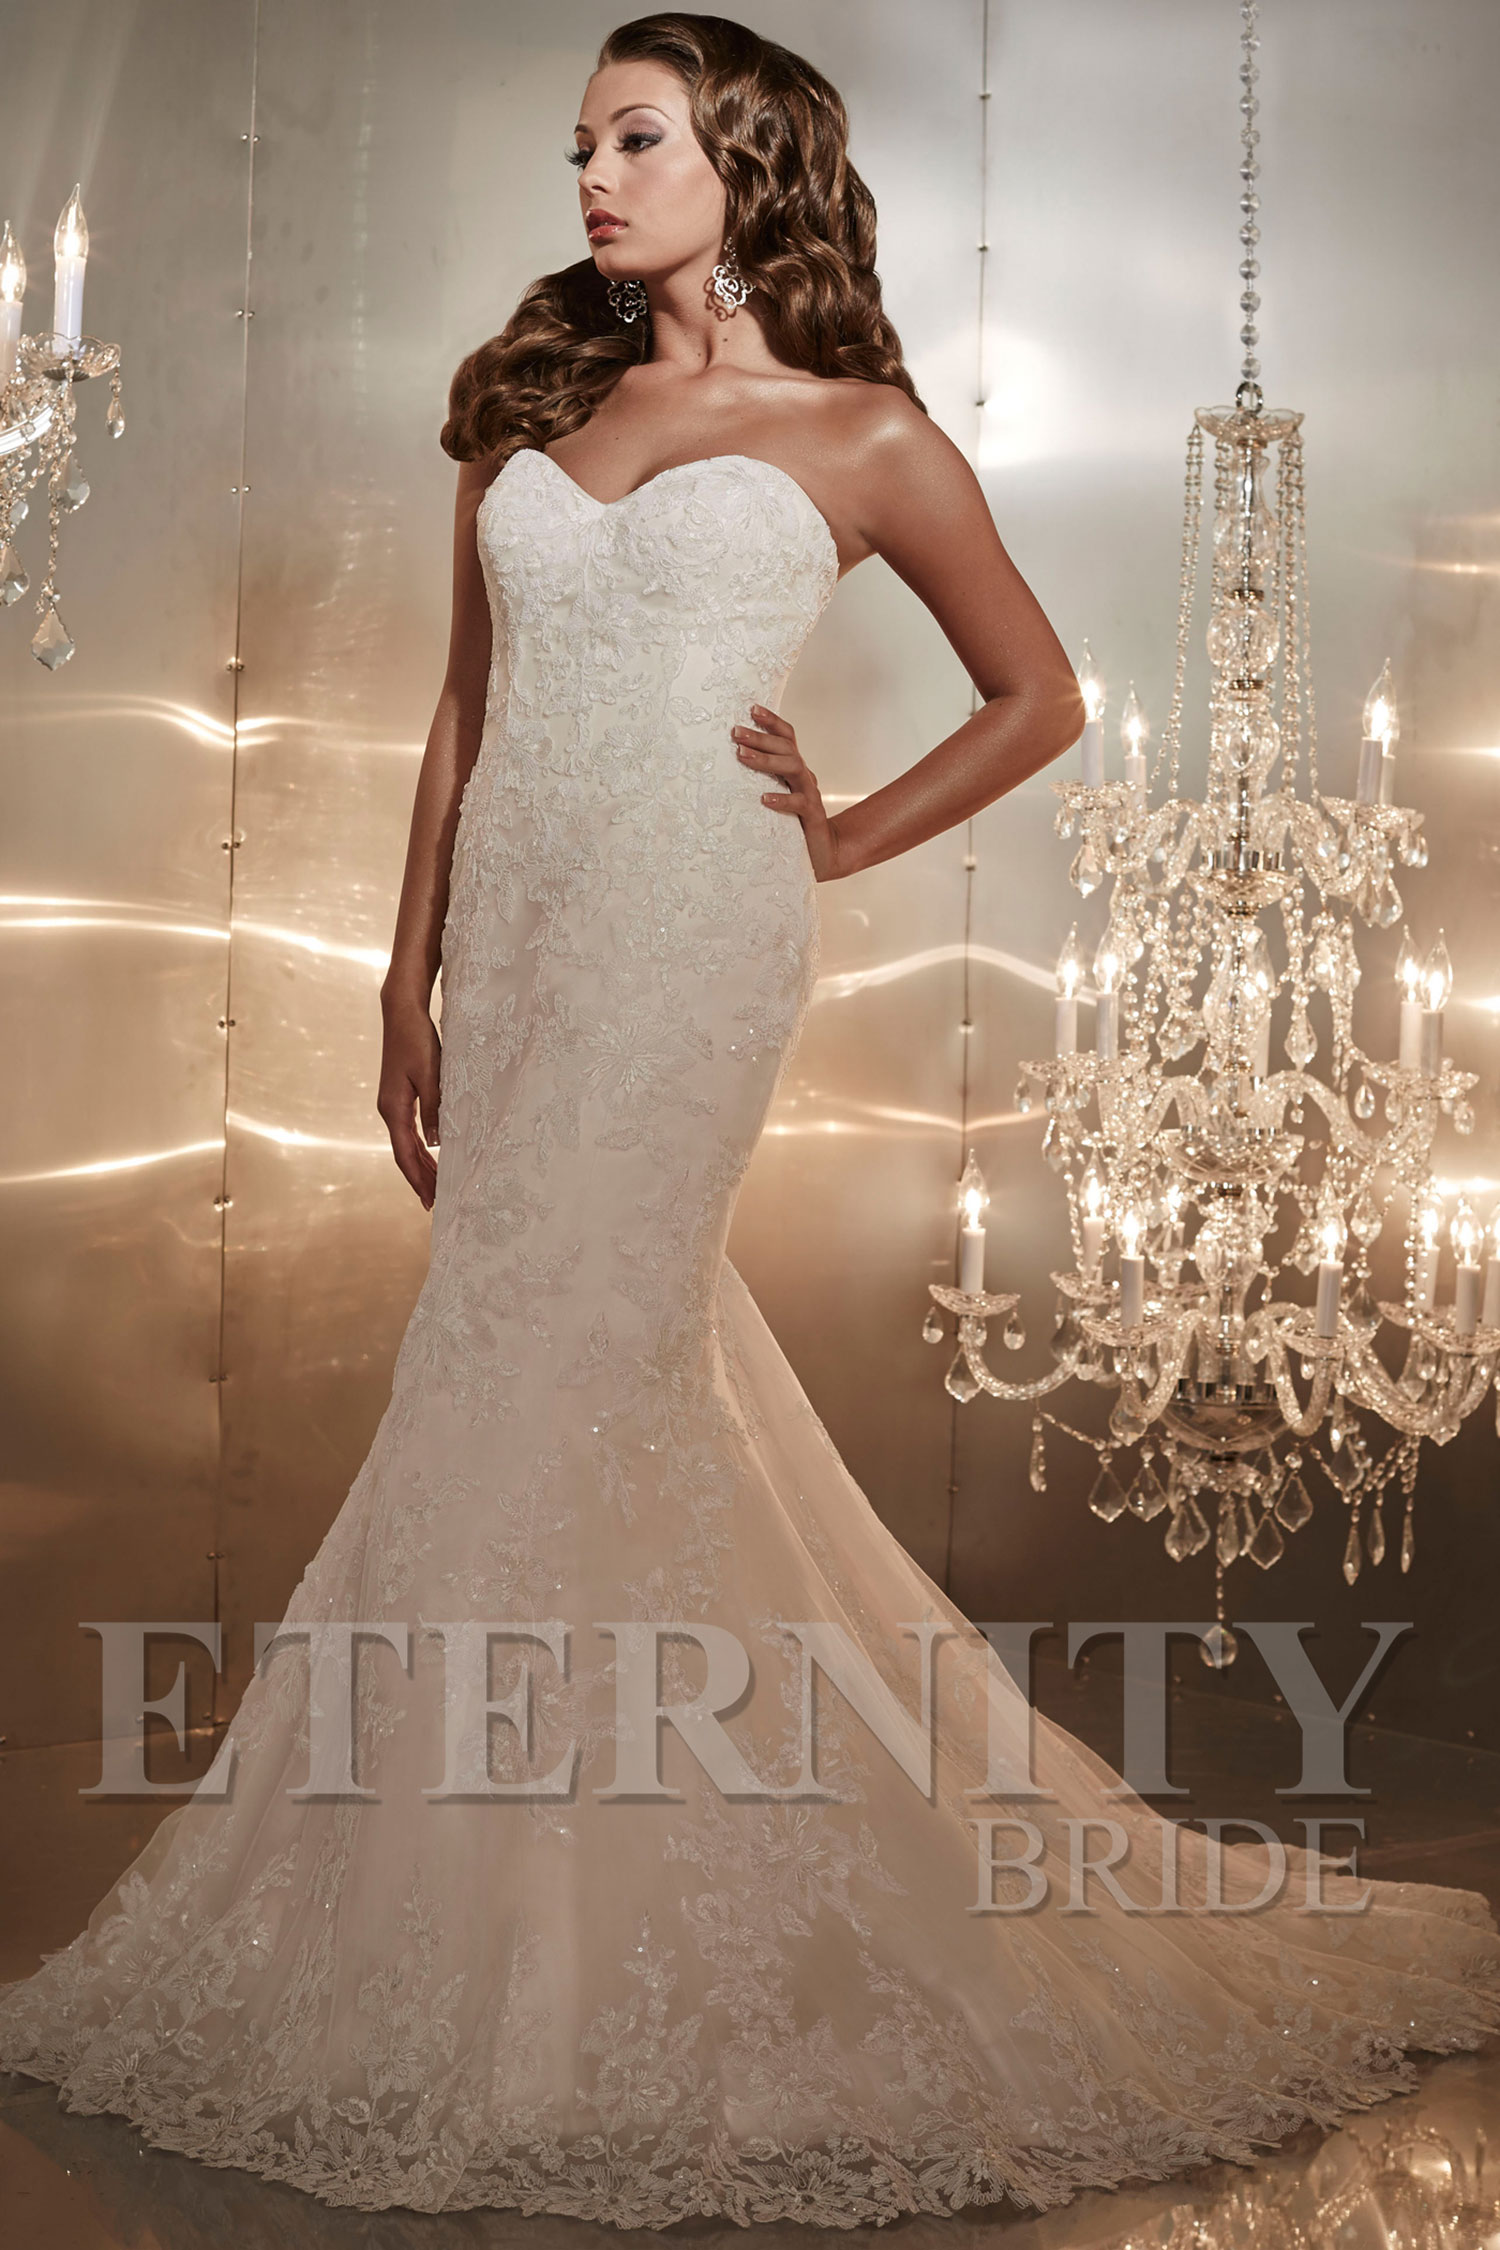 Eternity Bride D5225